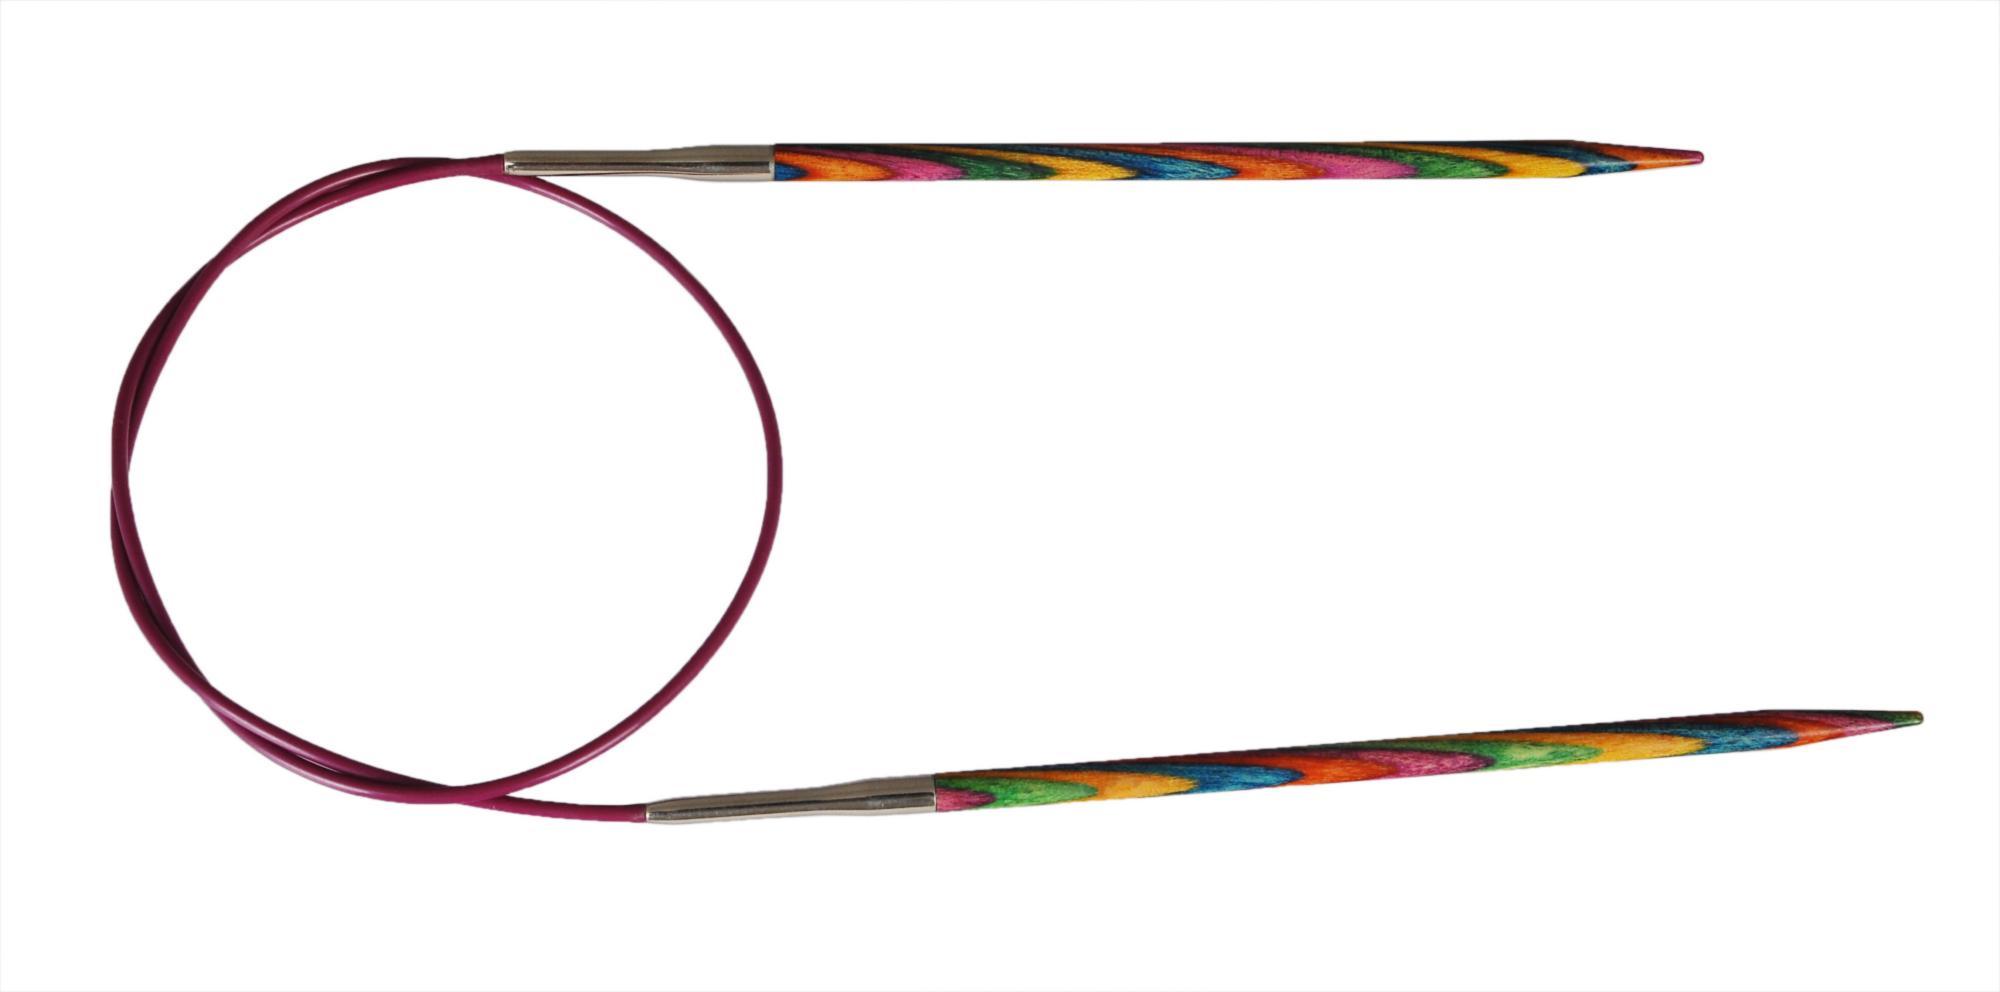 Спицы круговые 50 см Symfonie Wood KnitPro, 20393, 5.50 мм